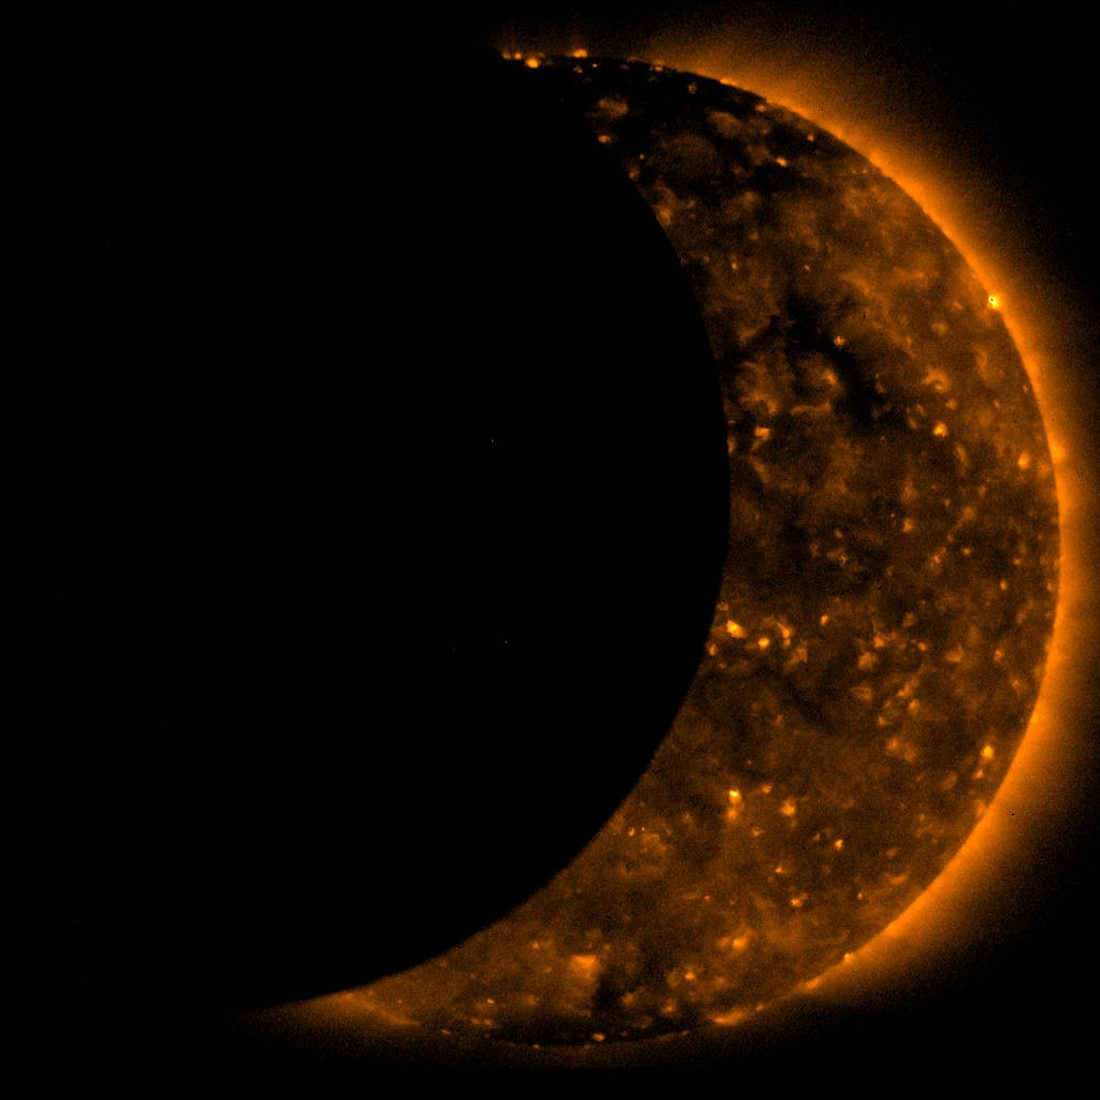 Moon Traversing the Sun